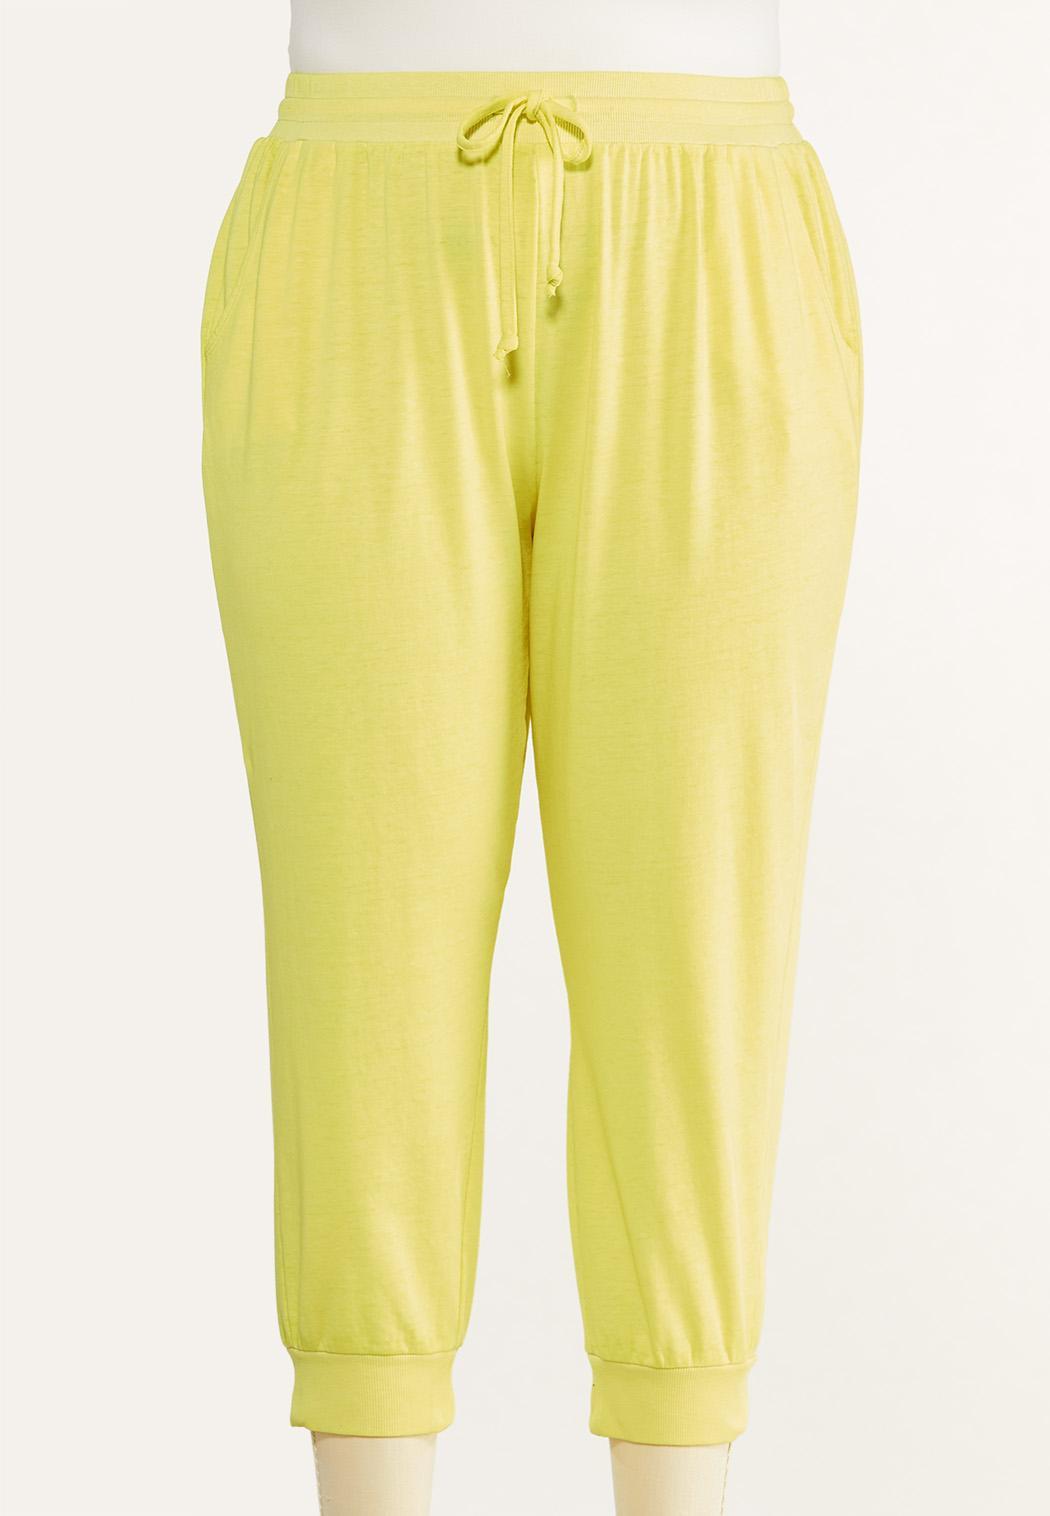 Plus Size Cropped Lemon Lime Joggers